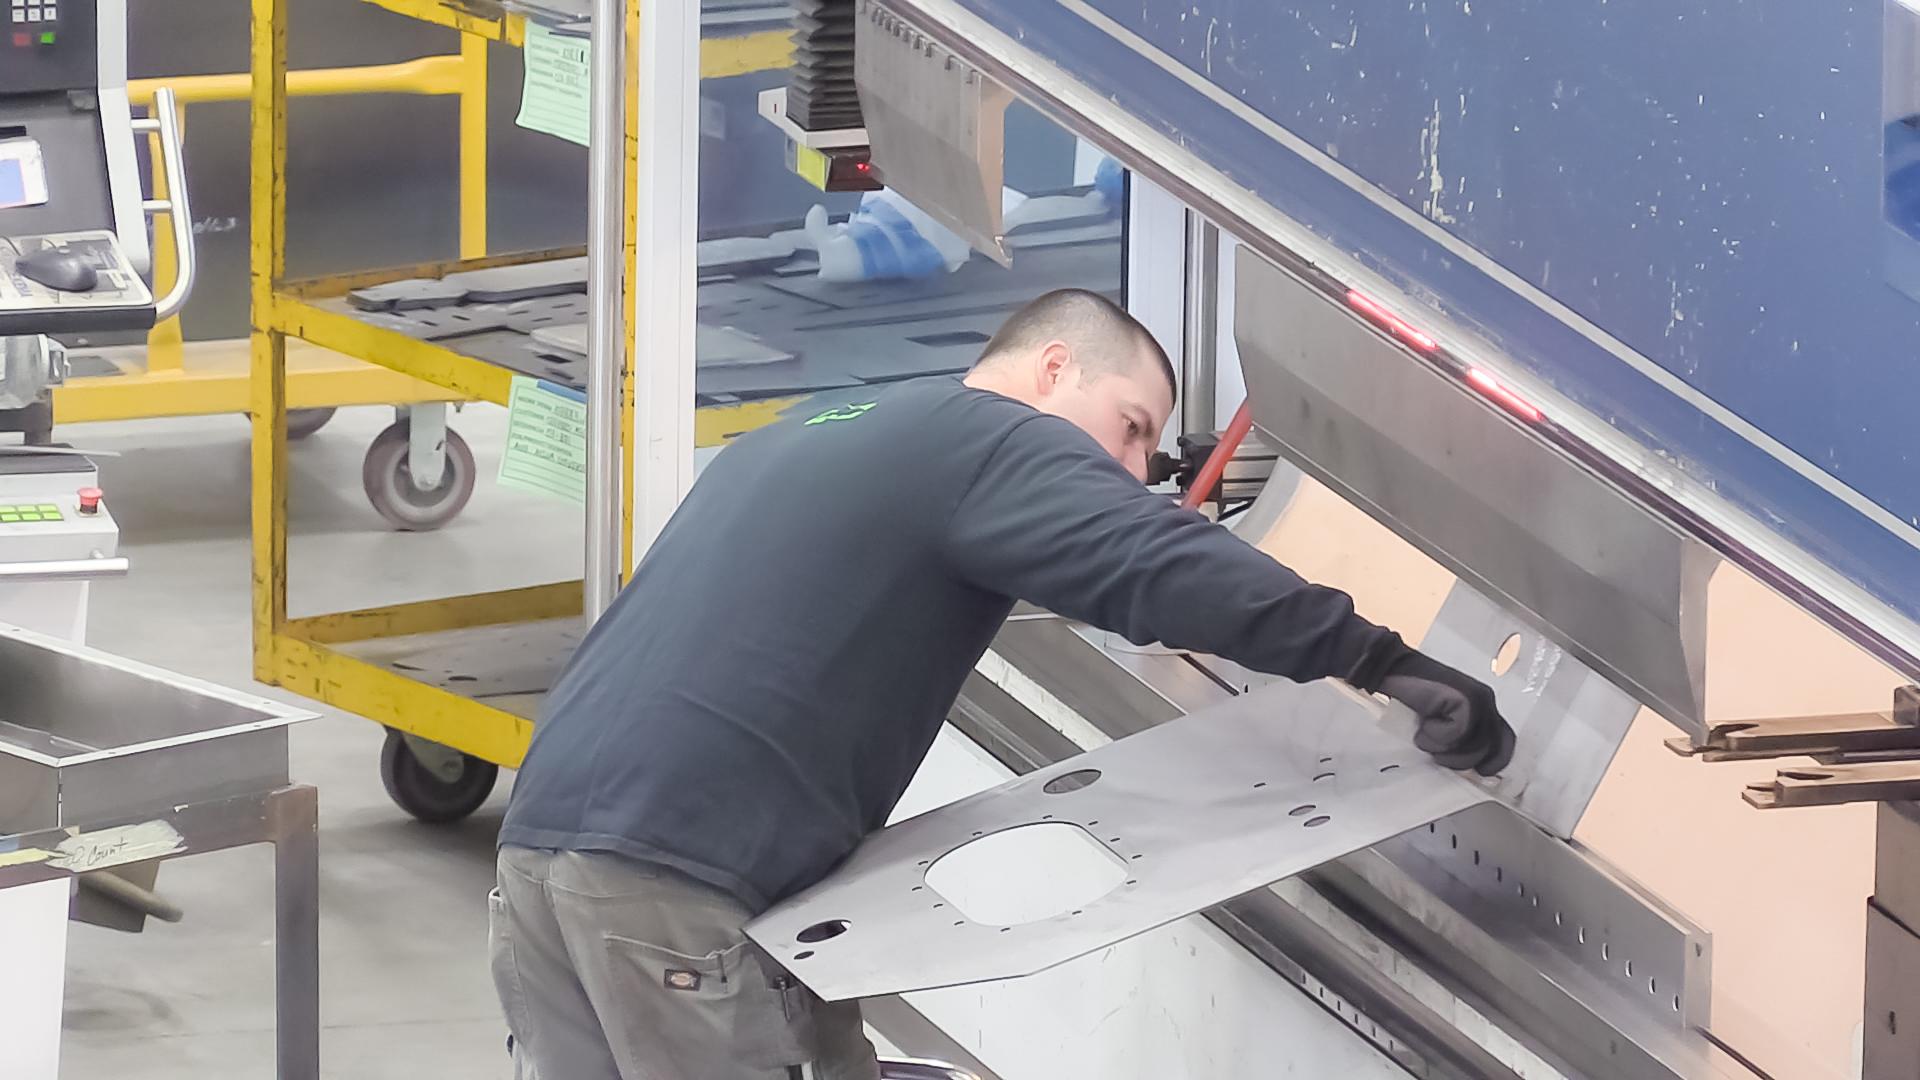 Worker Using Press Brake to Form Metal